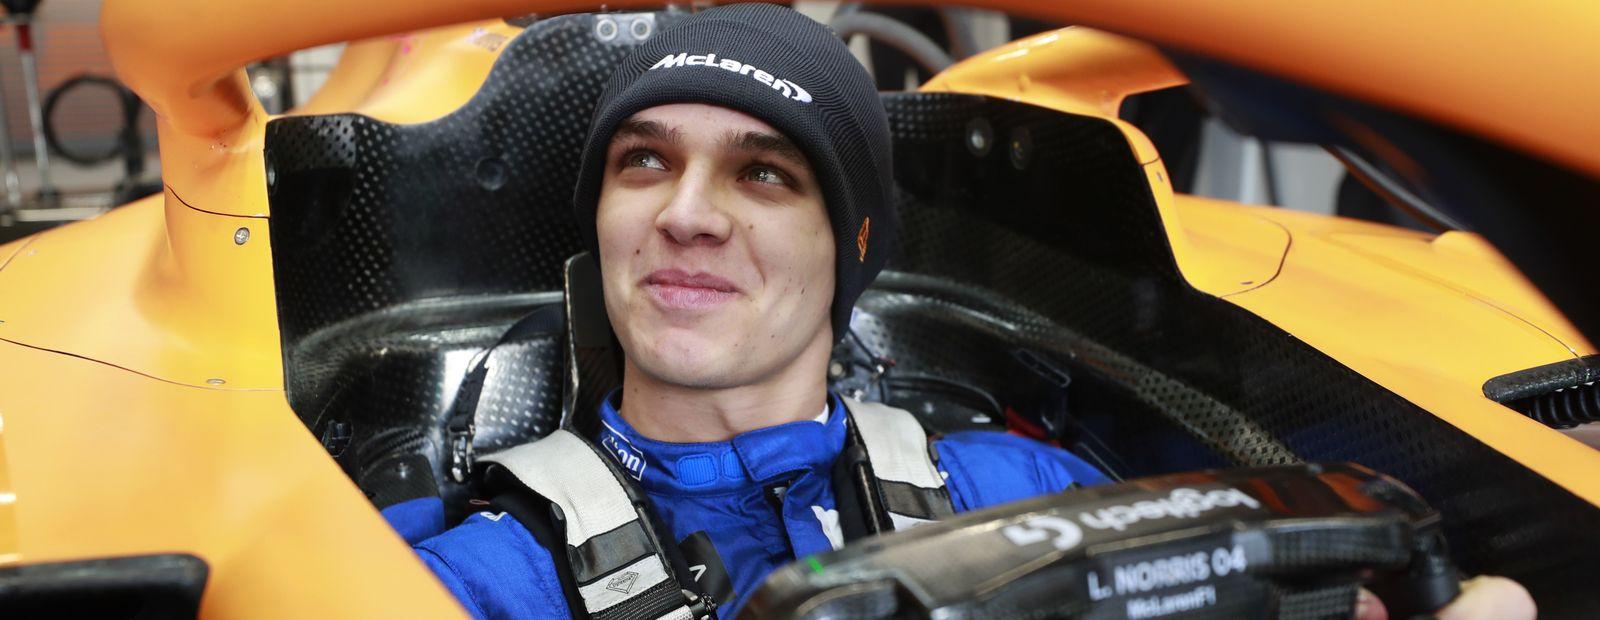 Logitech G and McLaren usher in a new era of racing